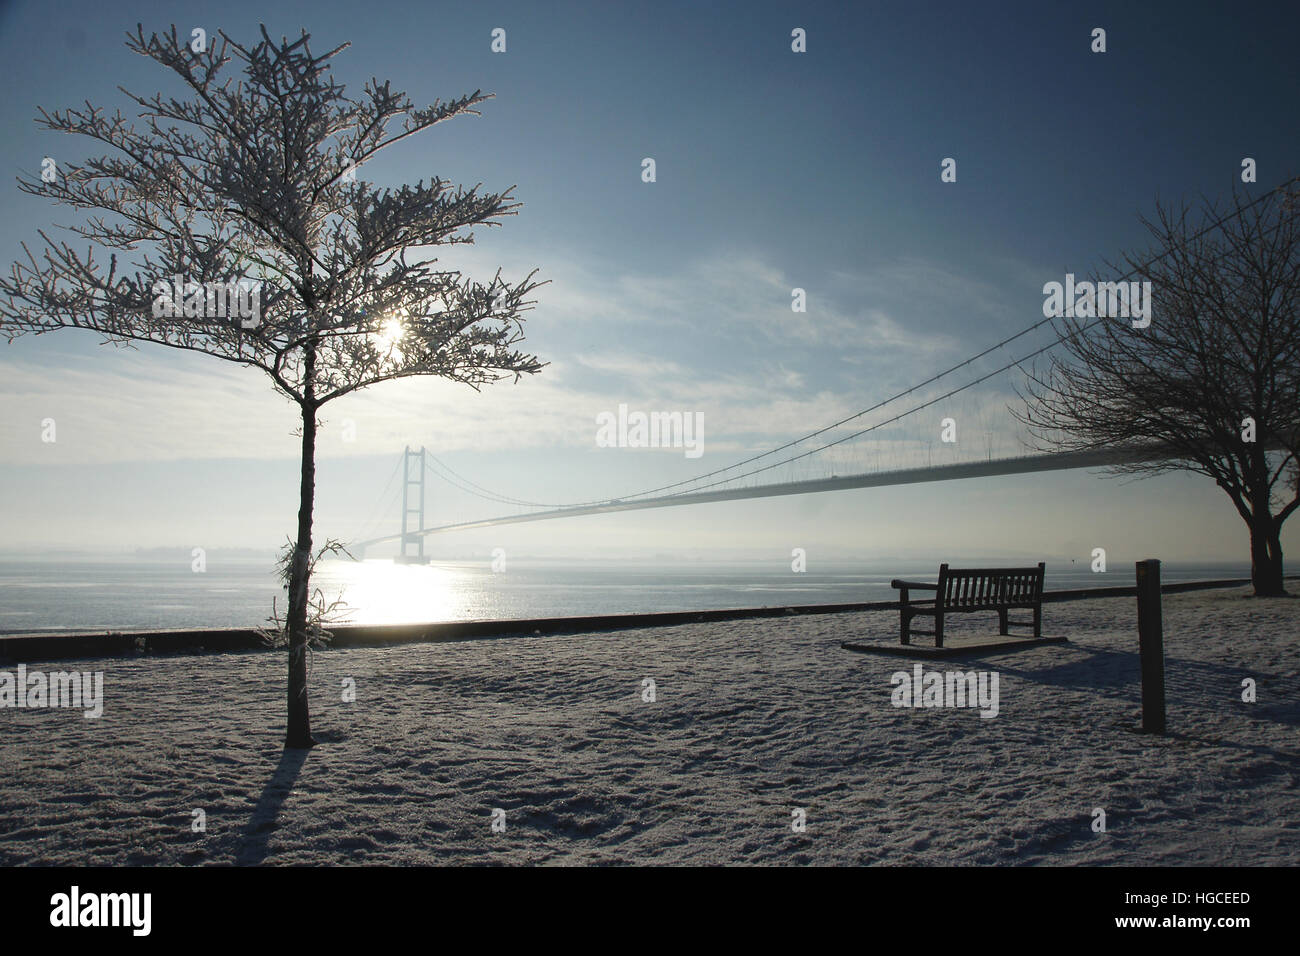 Paesaggi innevati, Humber Bridge, Hessle, East Yorkshire Immagini Stock